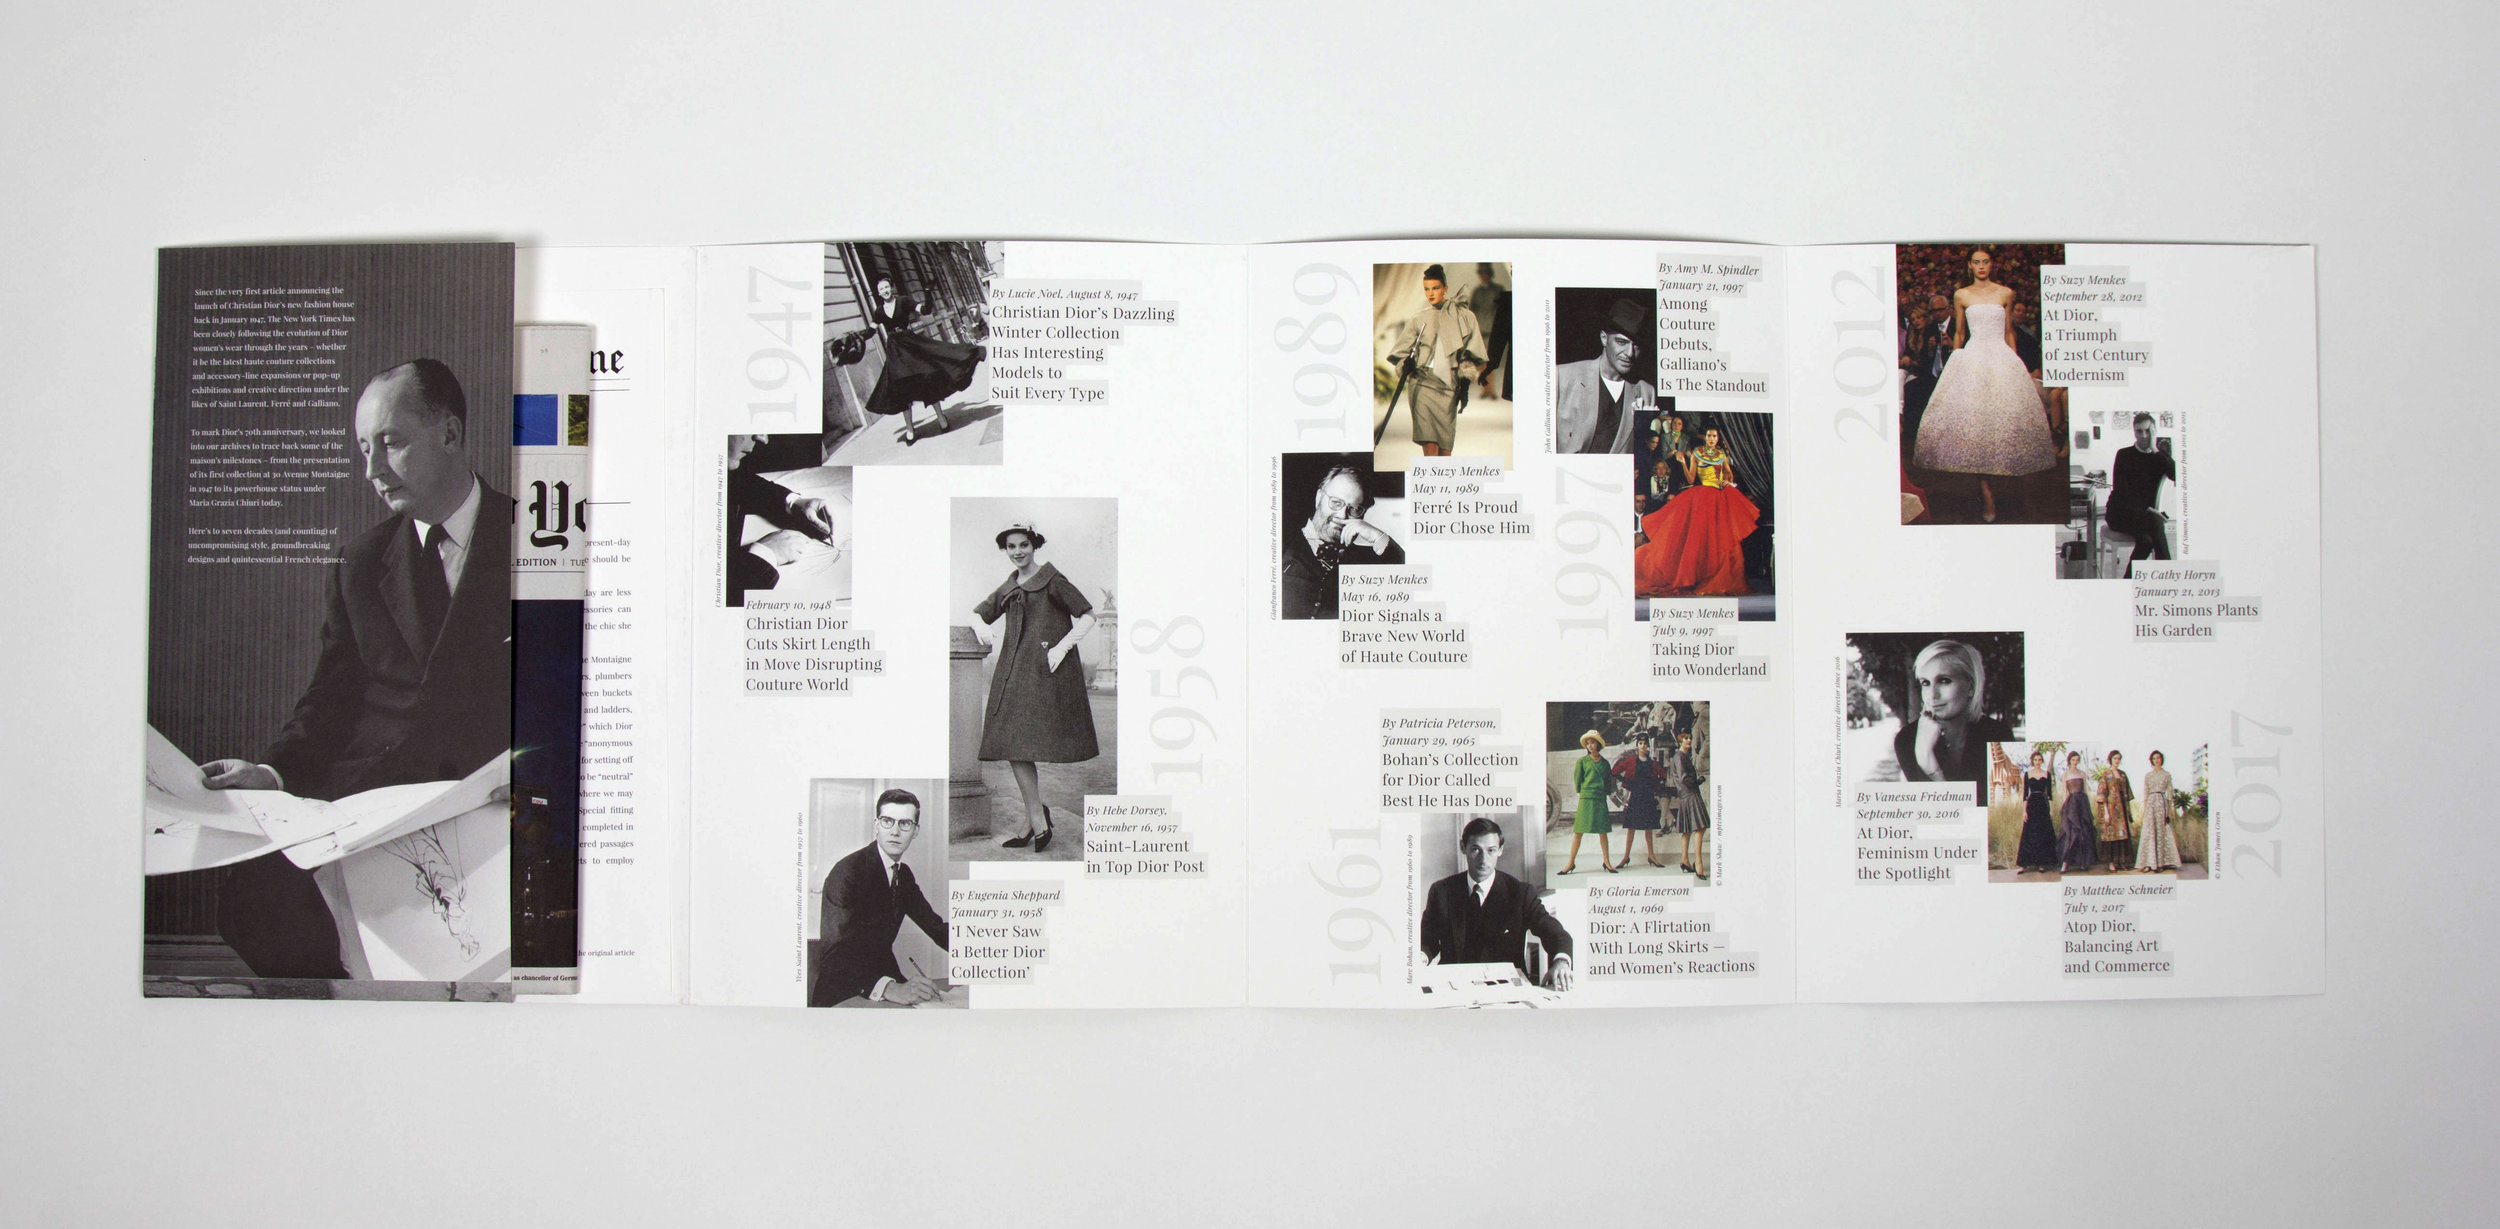 CBS_Website_Dior_Image05.jpg